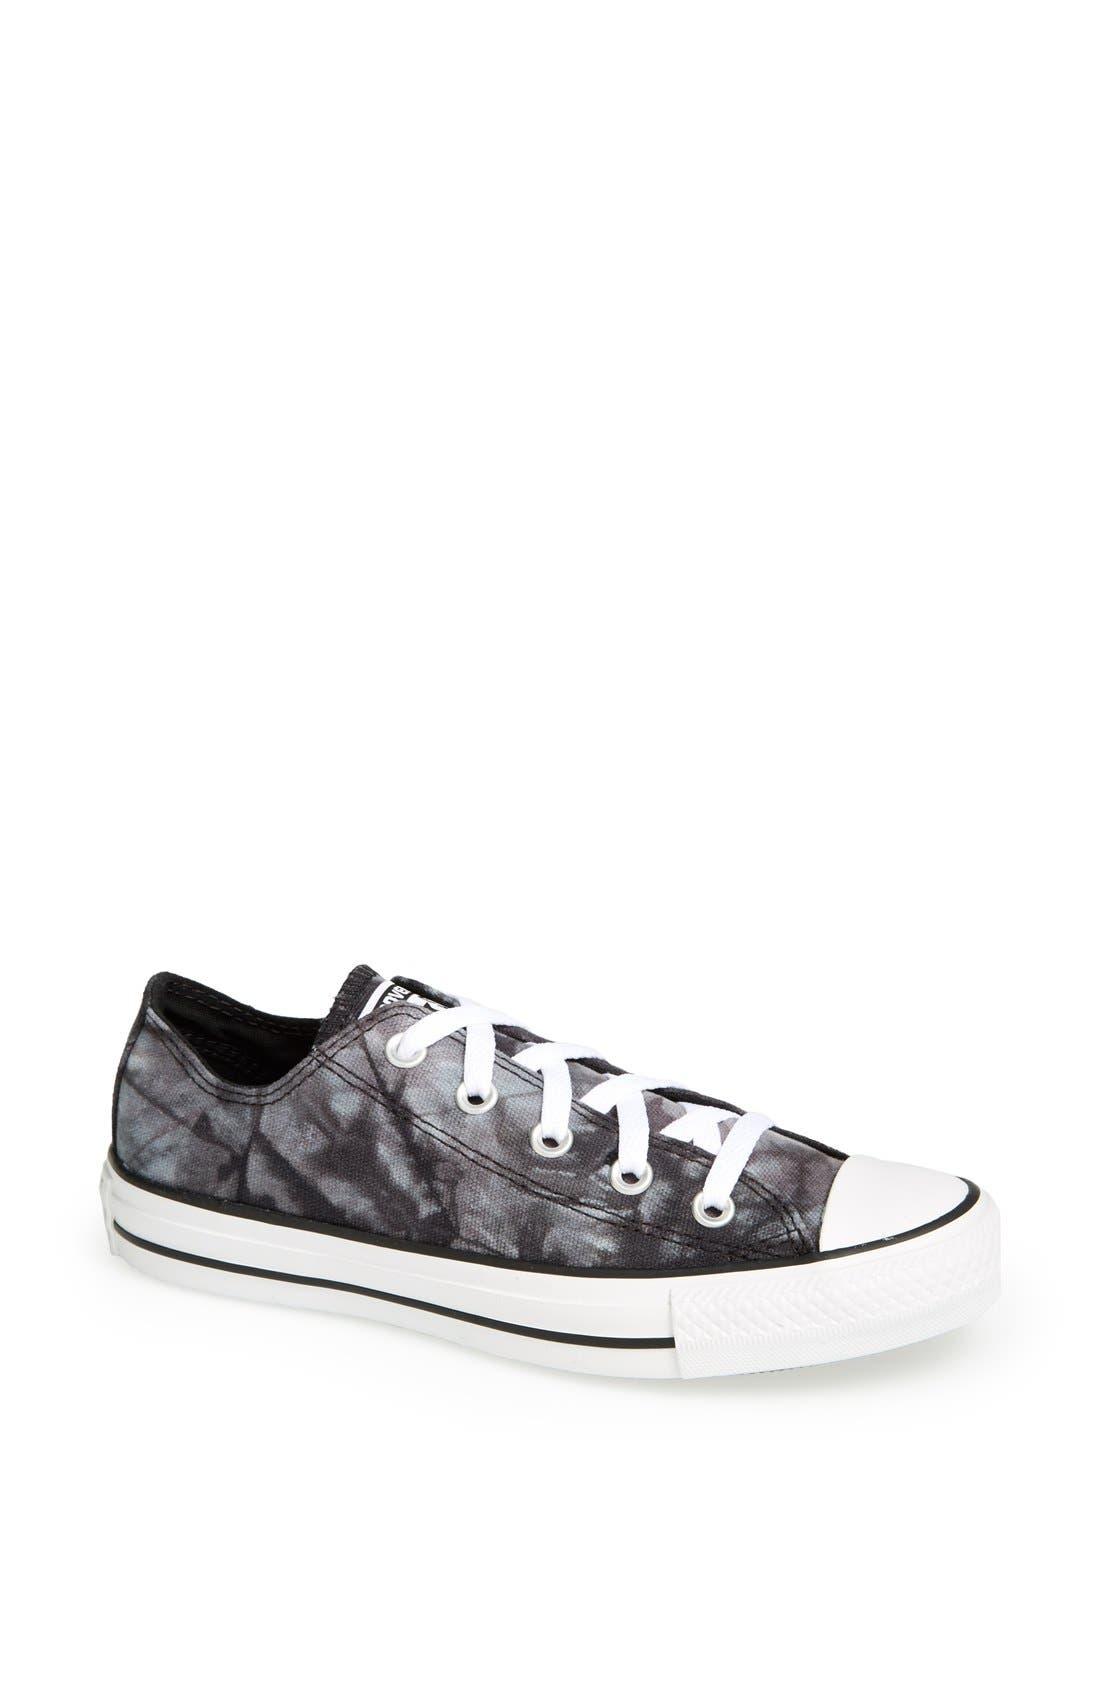 Alternate Image 1 Selected - Converse Chuck Taylor® All Star® 'Ox' Tie Dye Low Top Sneaker (Women)